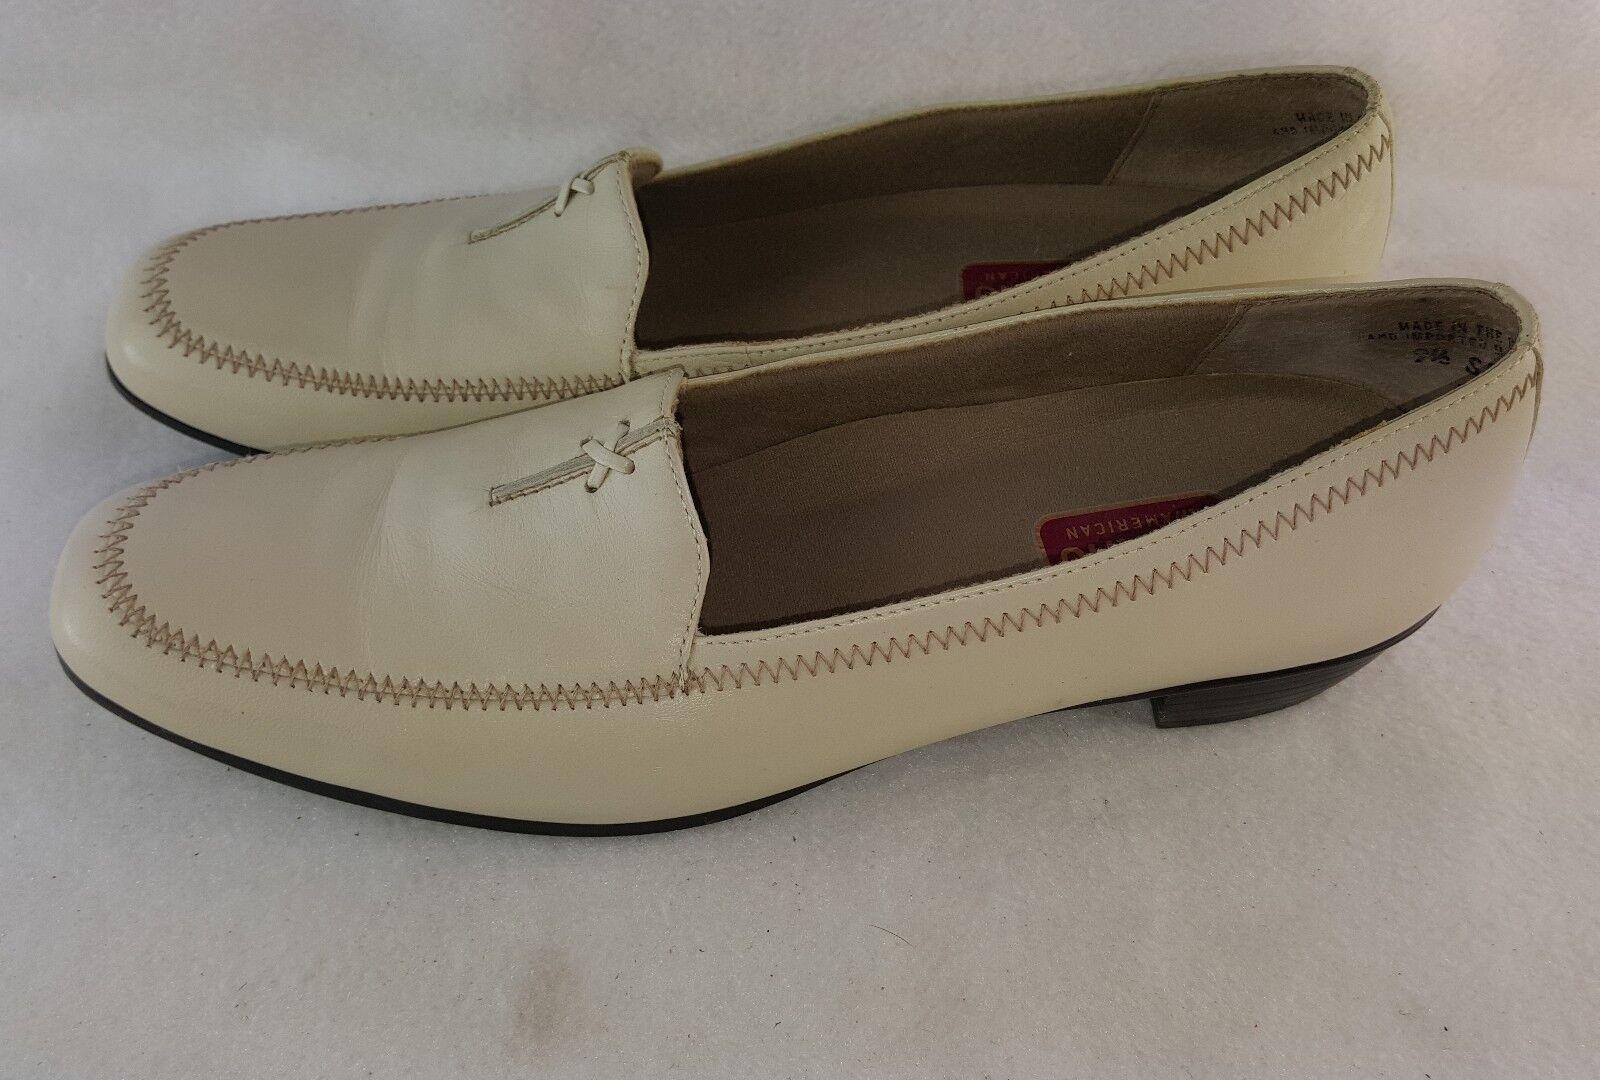 Munro American 'Lauren' Slip On Loafers Beige Leather Women's Size 9.5